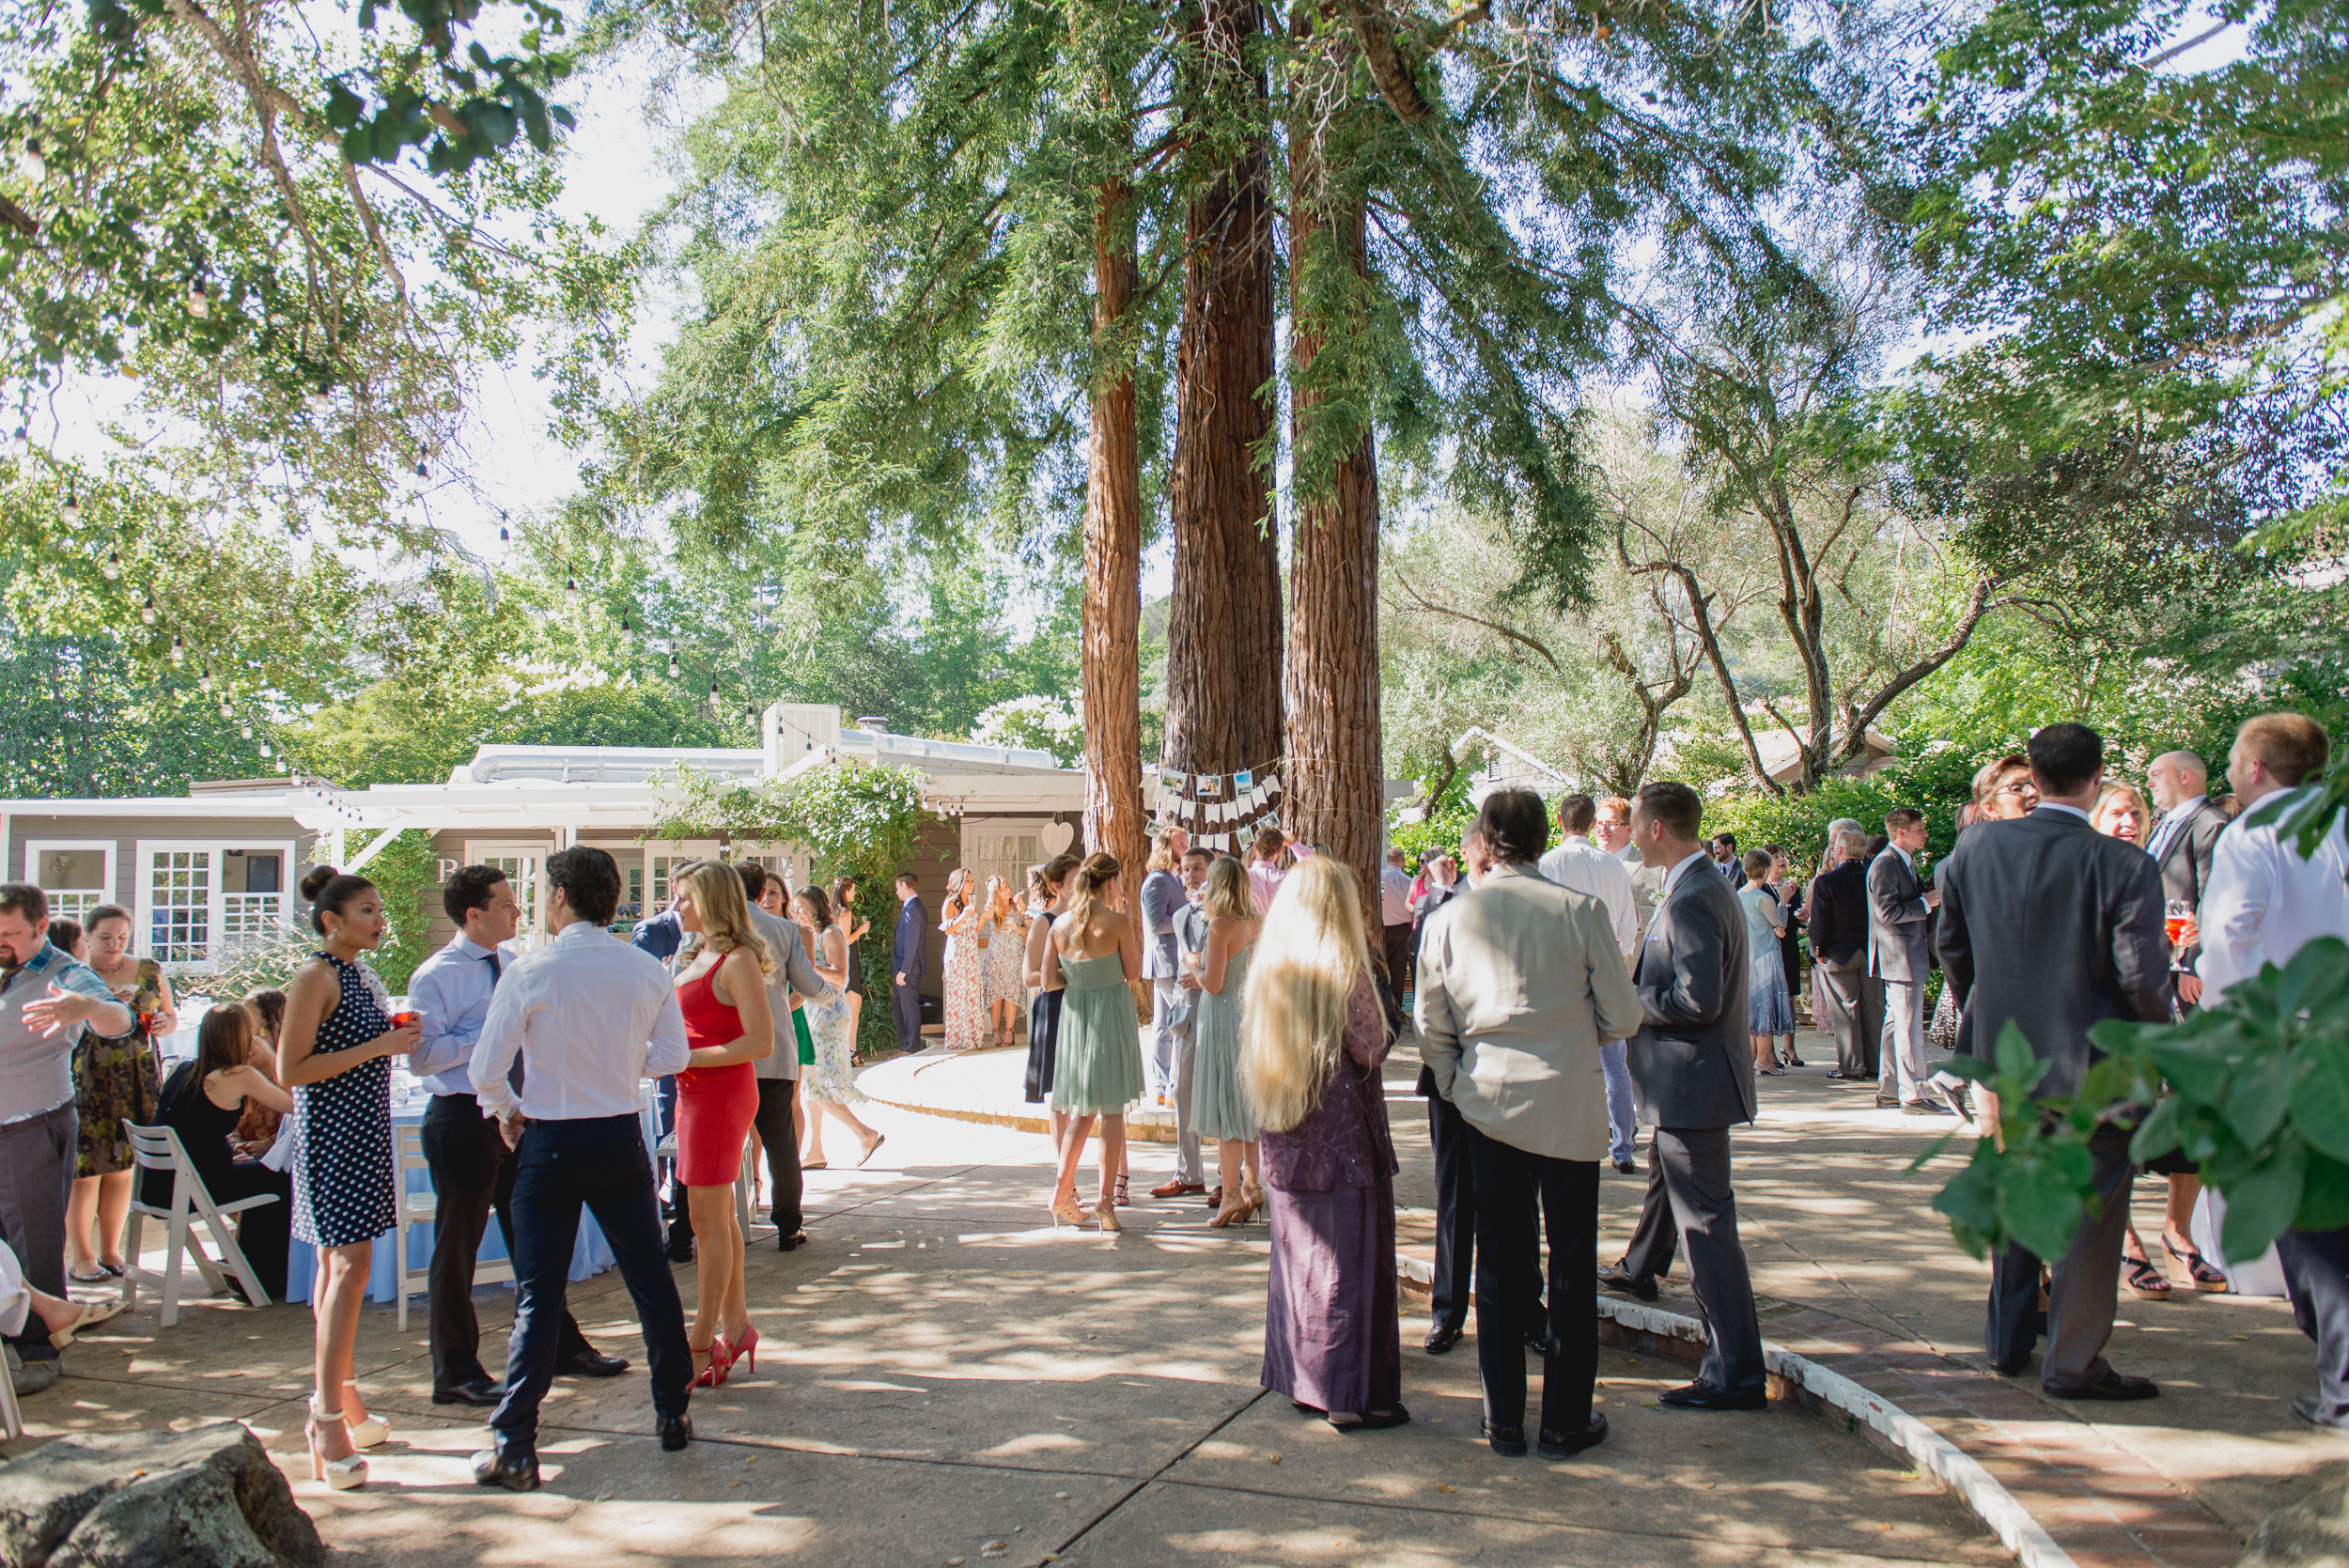 21-down-to-earth-marin-art-garden-center-wedding-vivianchen.jpg